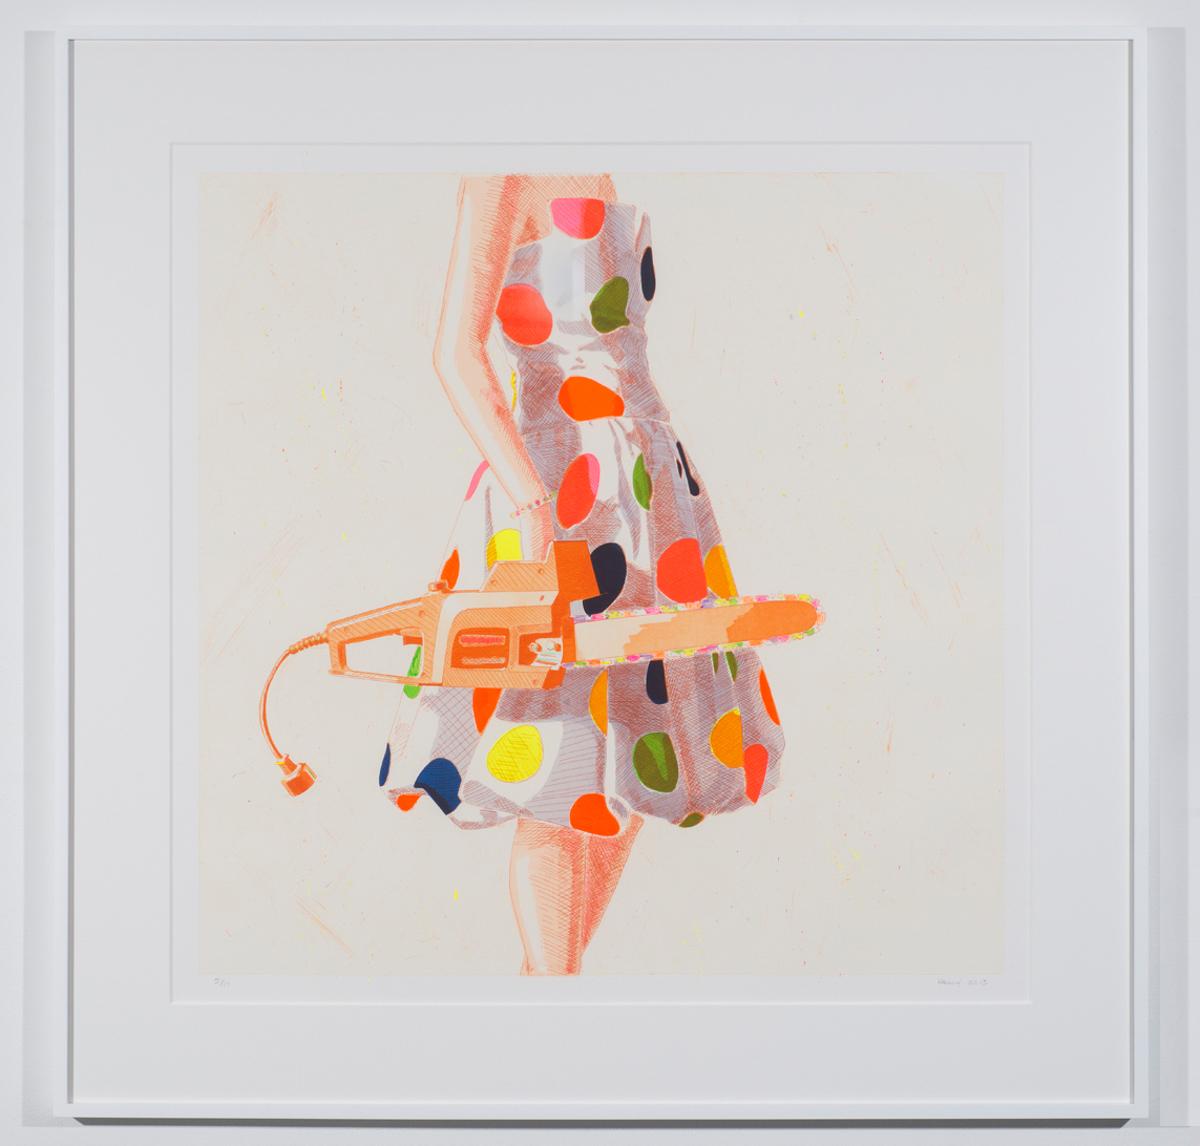 Twister Sister (Orange), 2015